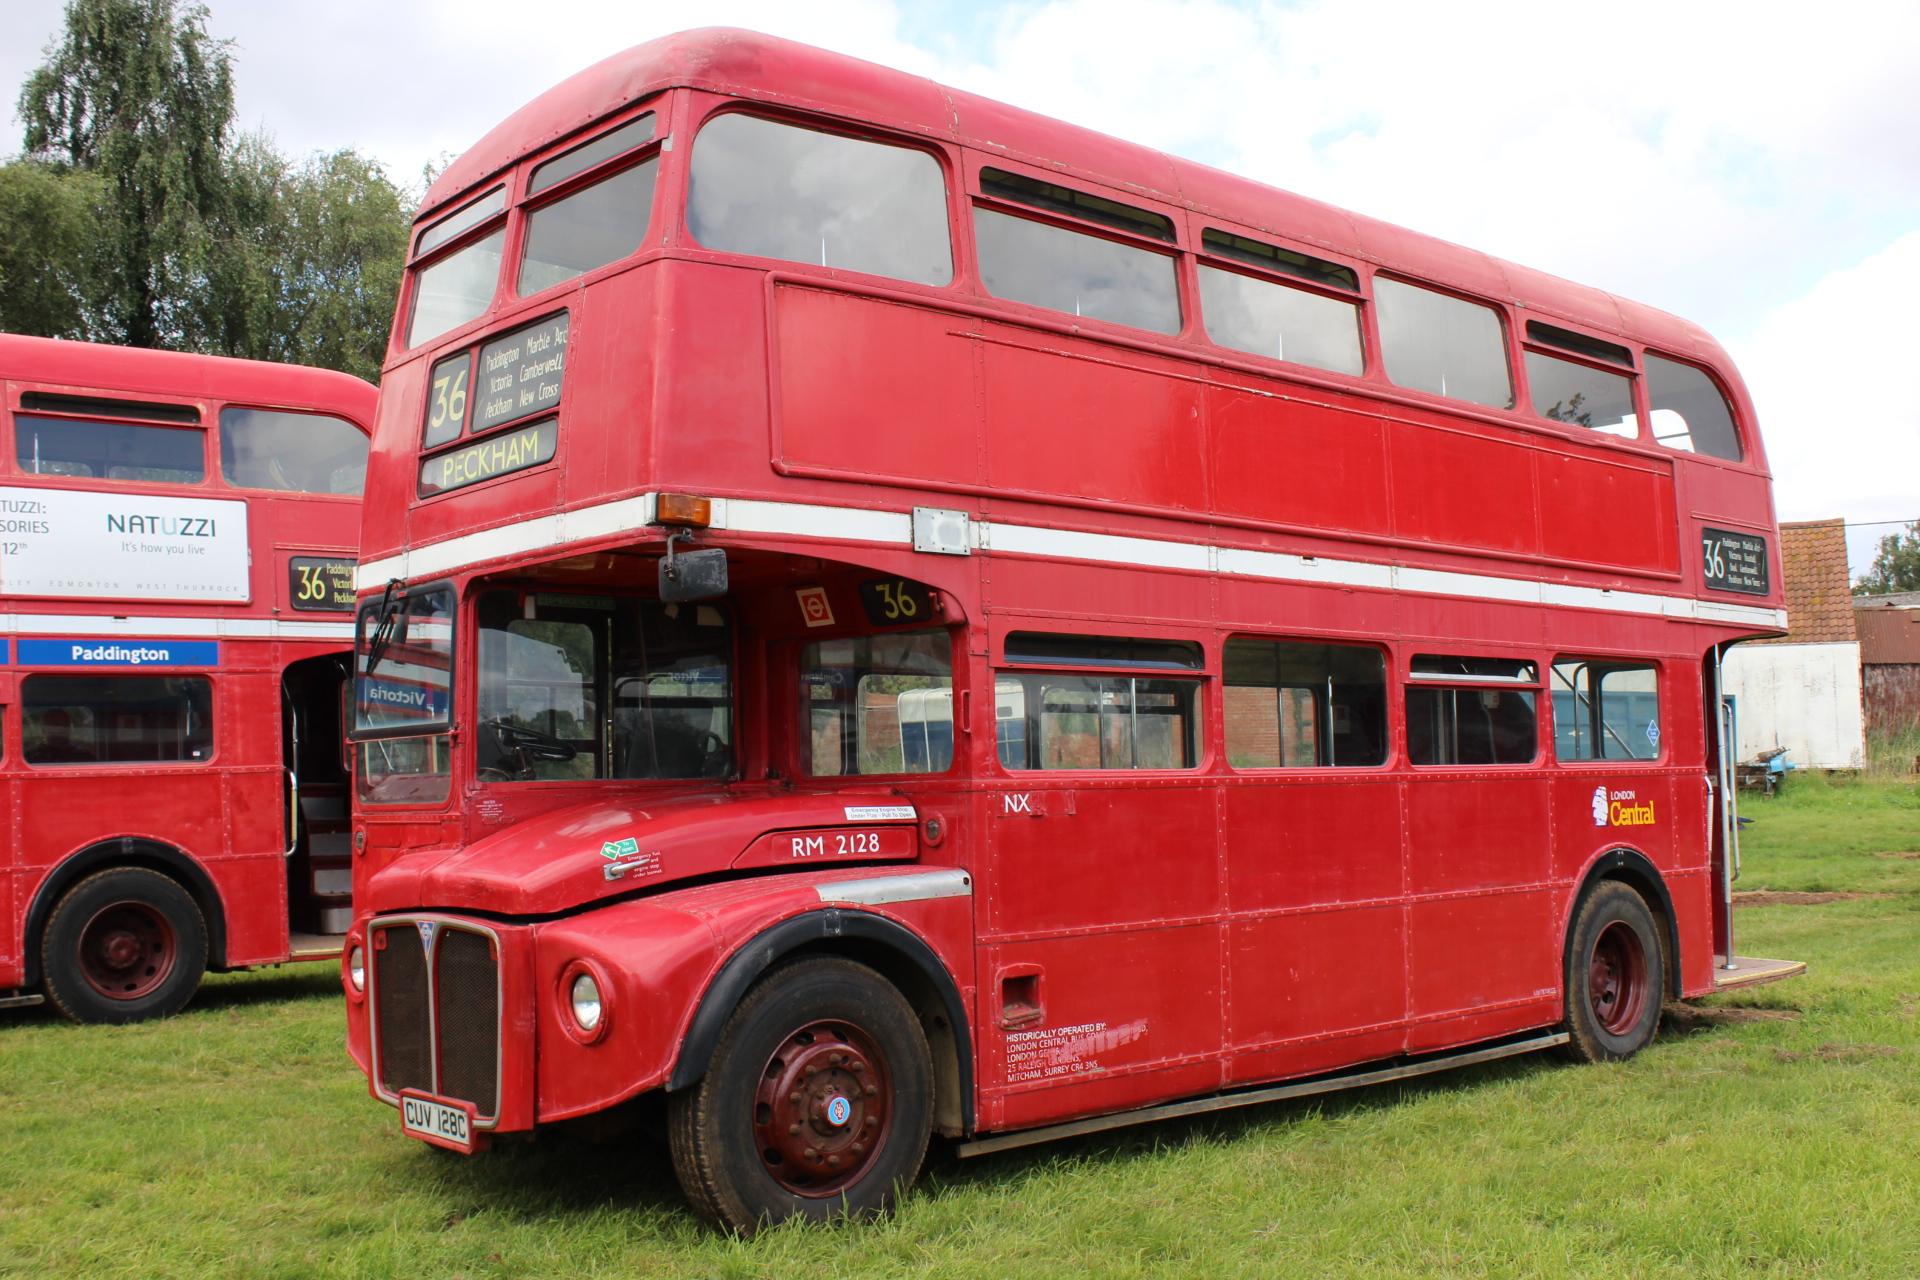 1965 AEC PARK ROYAL ROUTEMASTER 64 SEAT DOUBLE DECK BUS